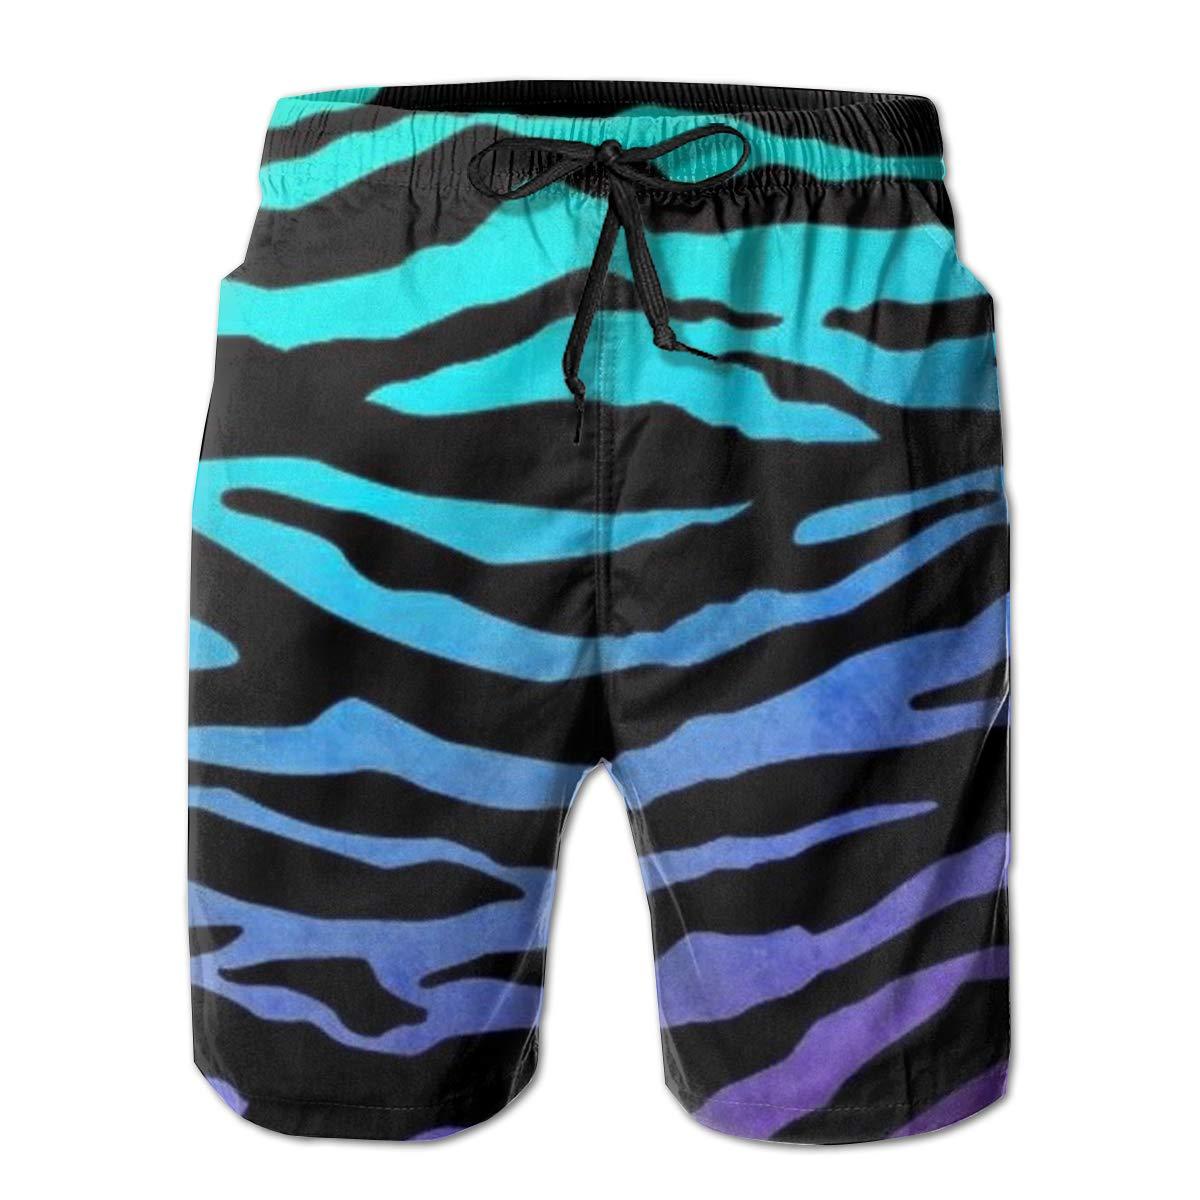 AMRANDOM Boys Board Shorts Purple Blue Green Zebra Quick Dry Swim Surf Trunks